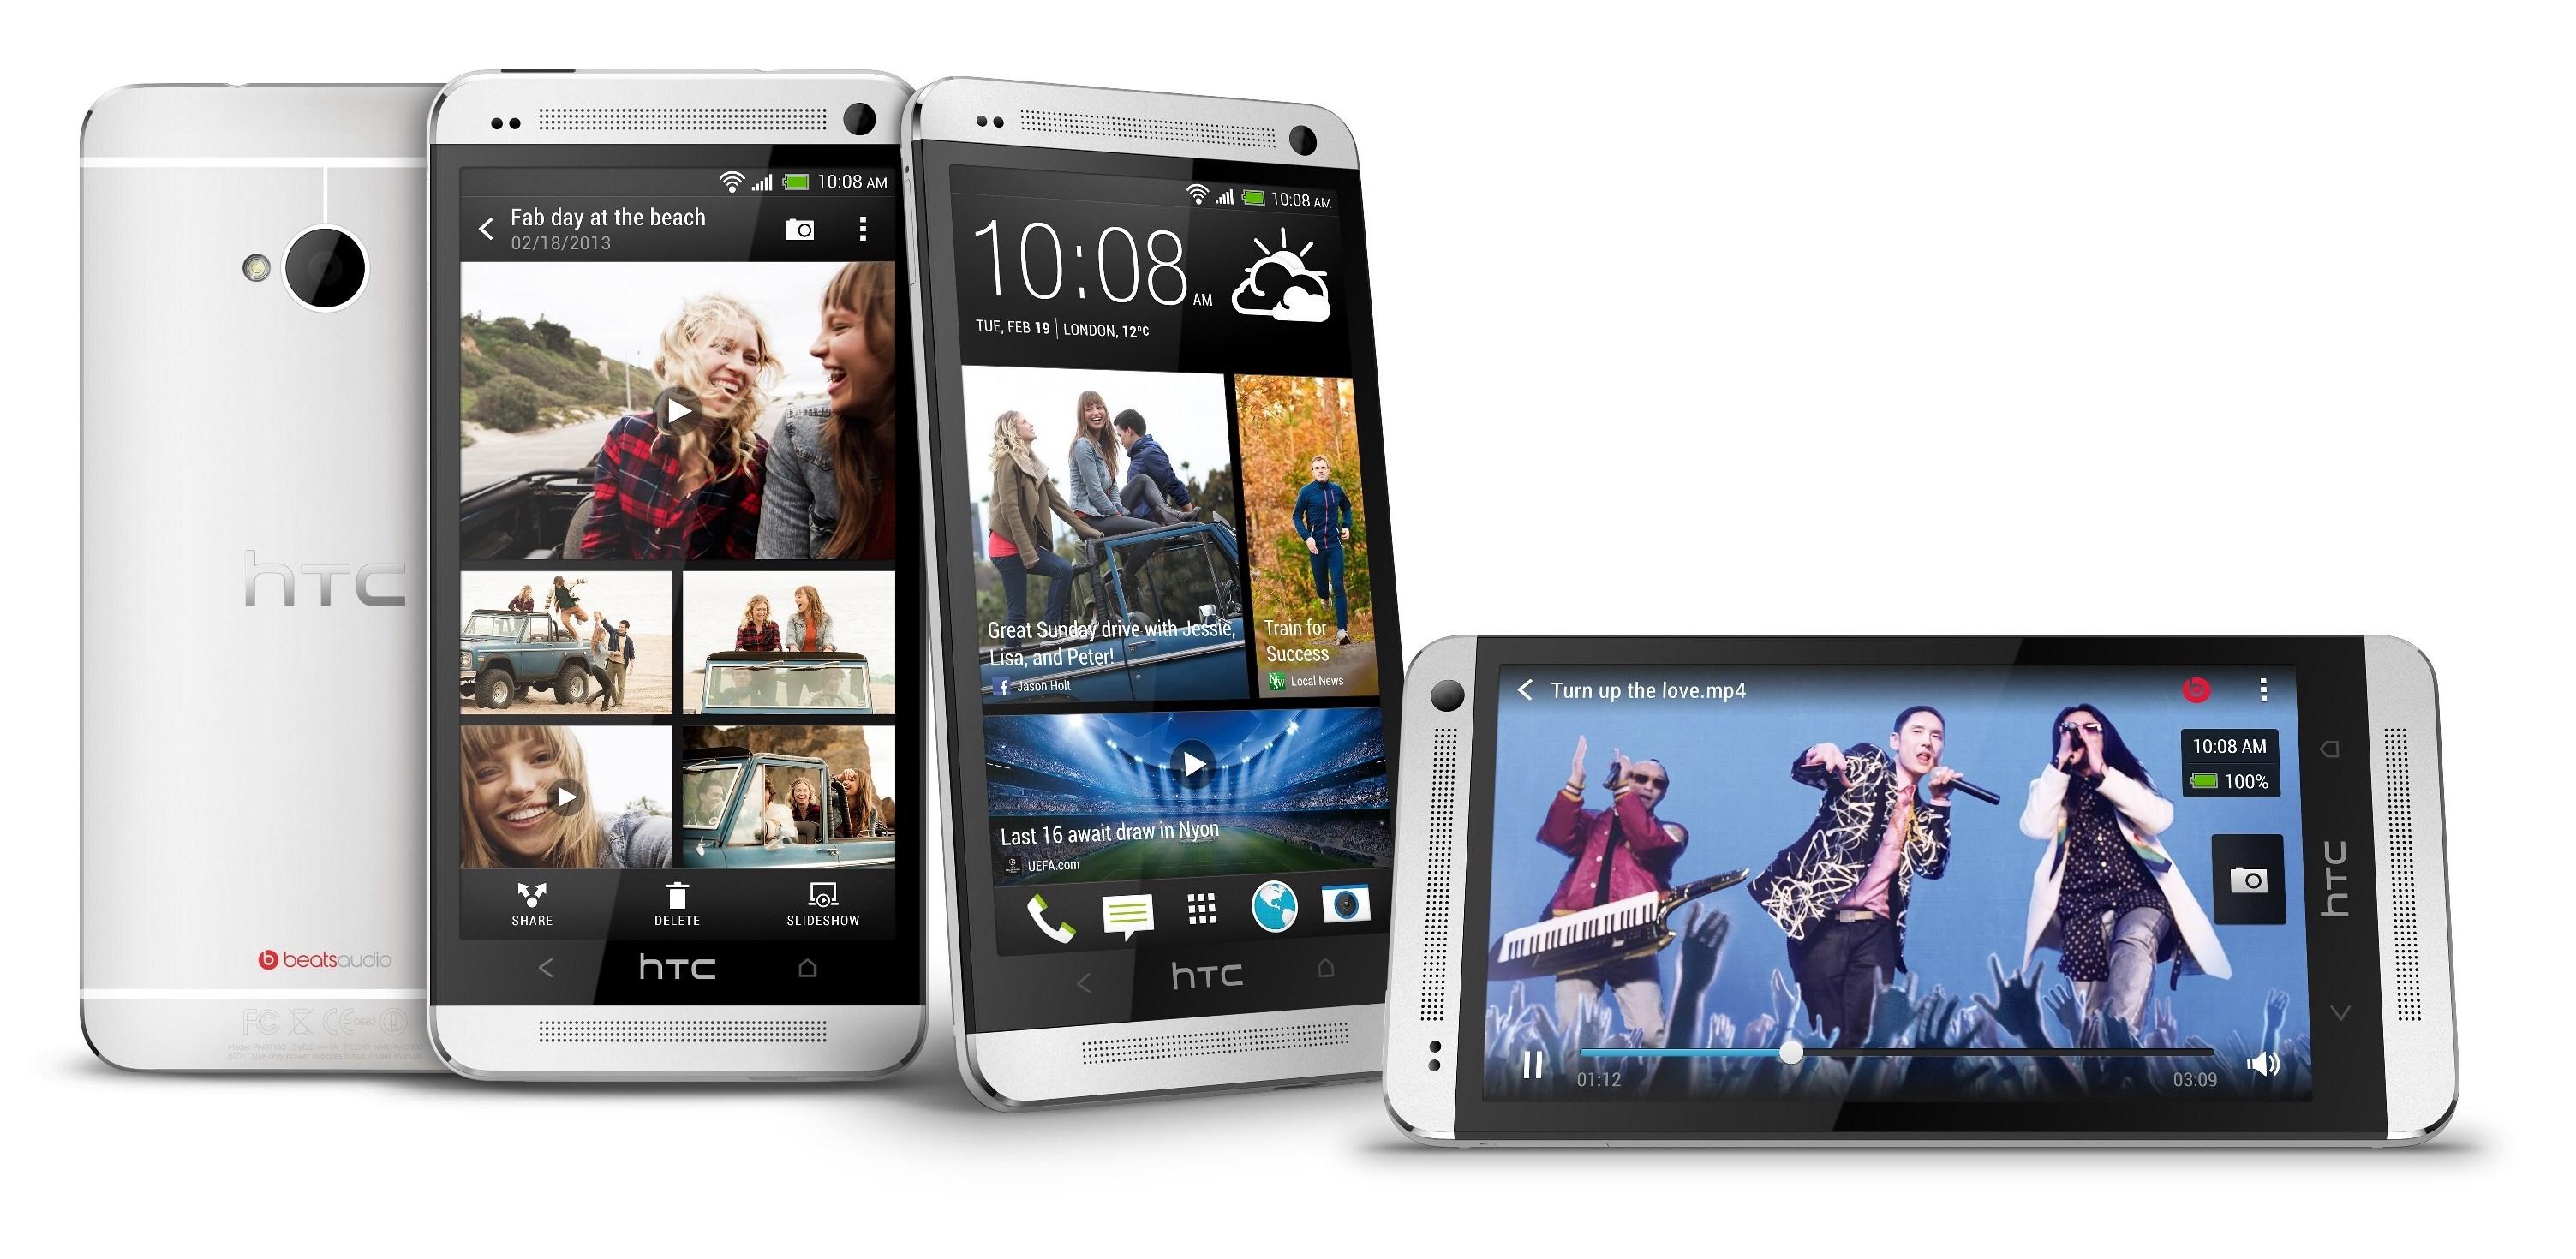 HTC_One_M7.jpg